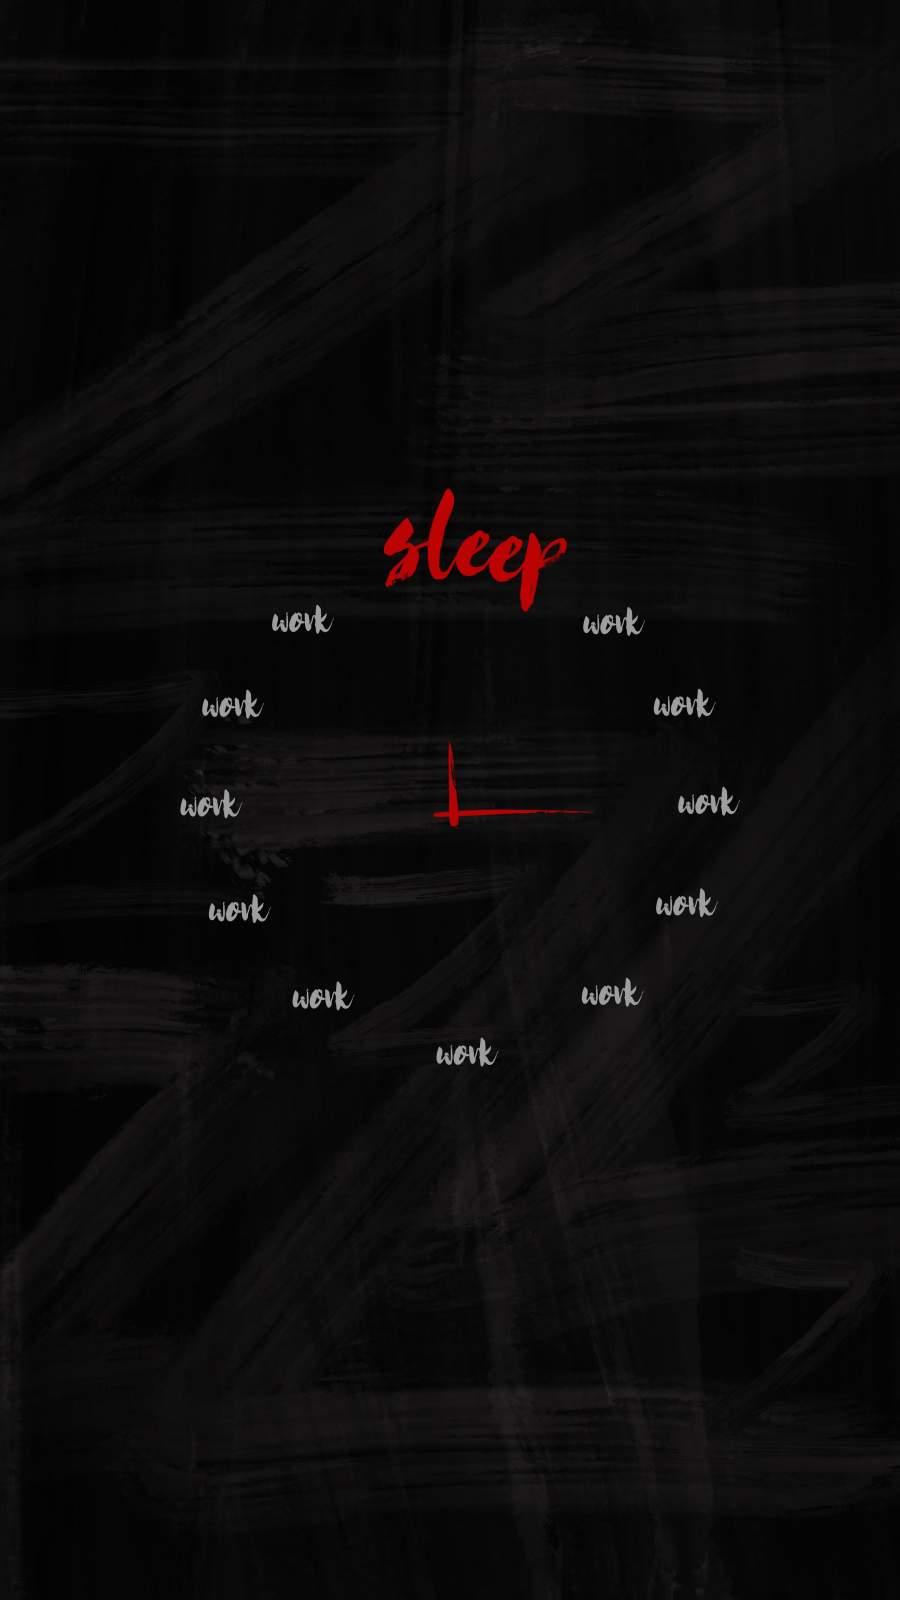 Sleep Clock iPhone Wallpaper